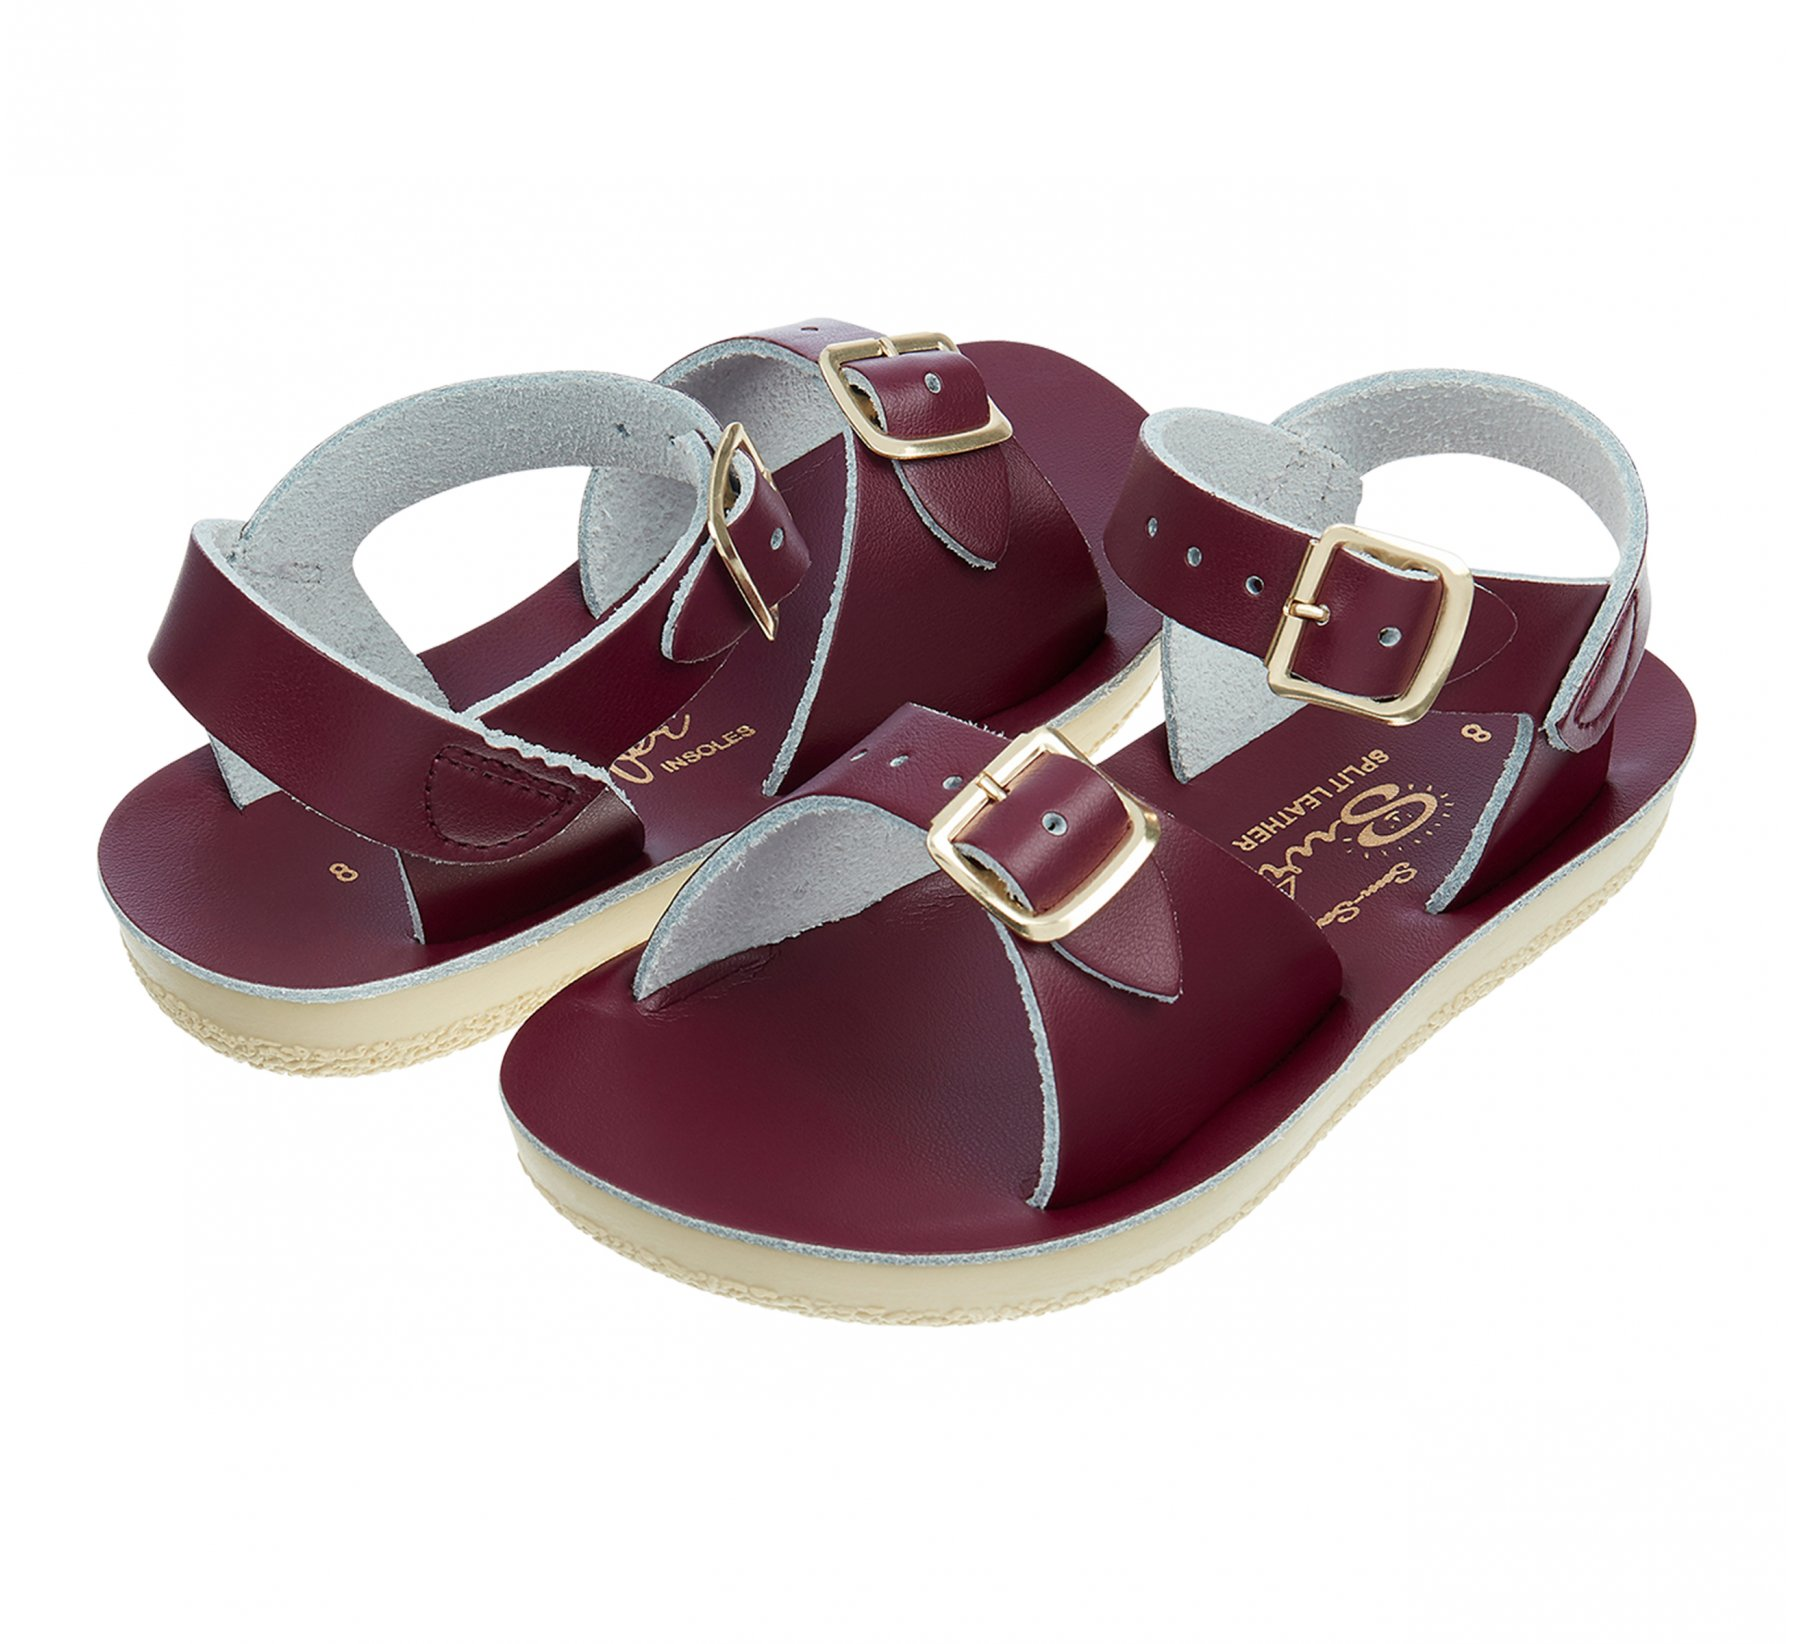 Surfer Claret  - Salt Water Sandals